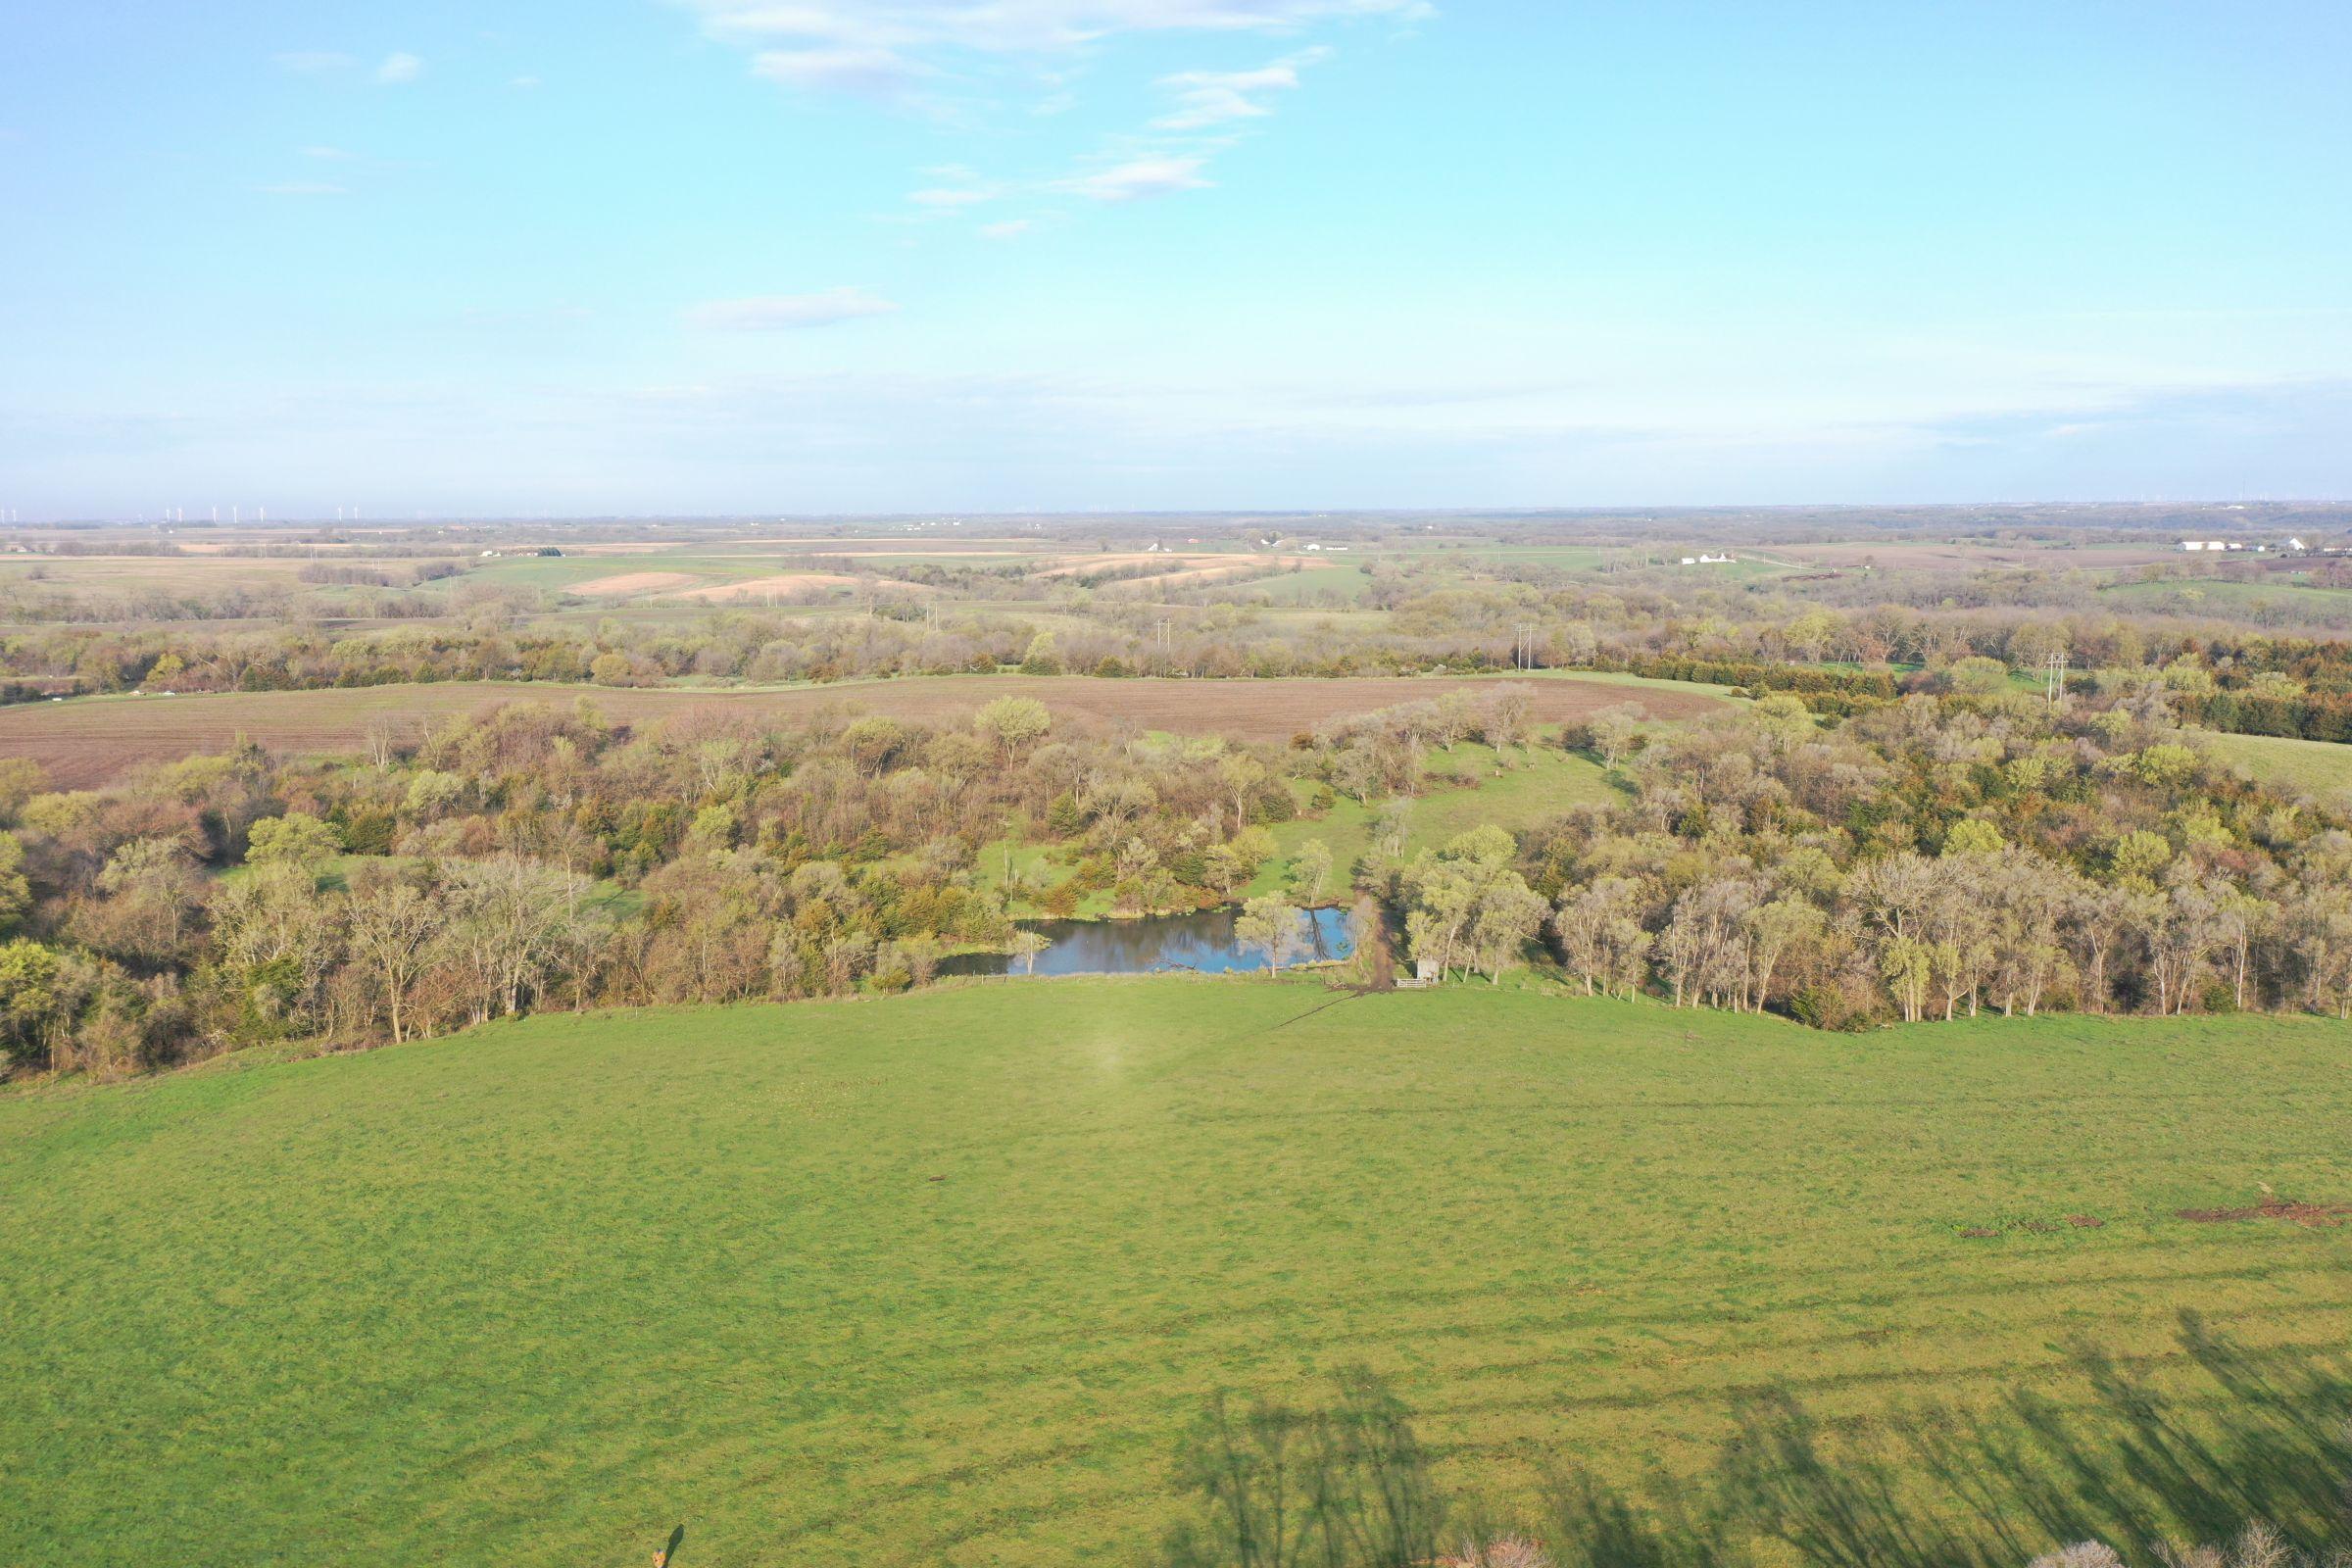 land-madison-county-iowa-21-acres-listing-number-15500-2-2021-04-28-193825.JPG